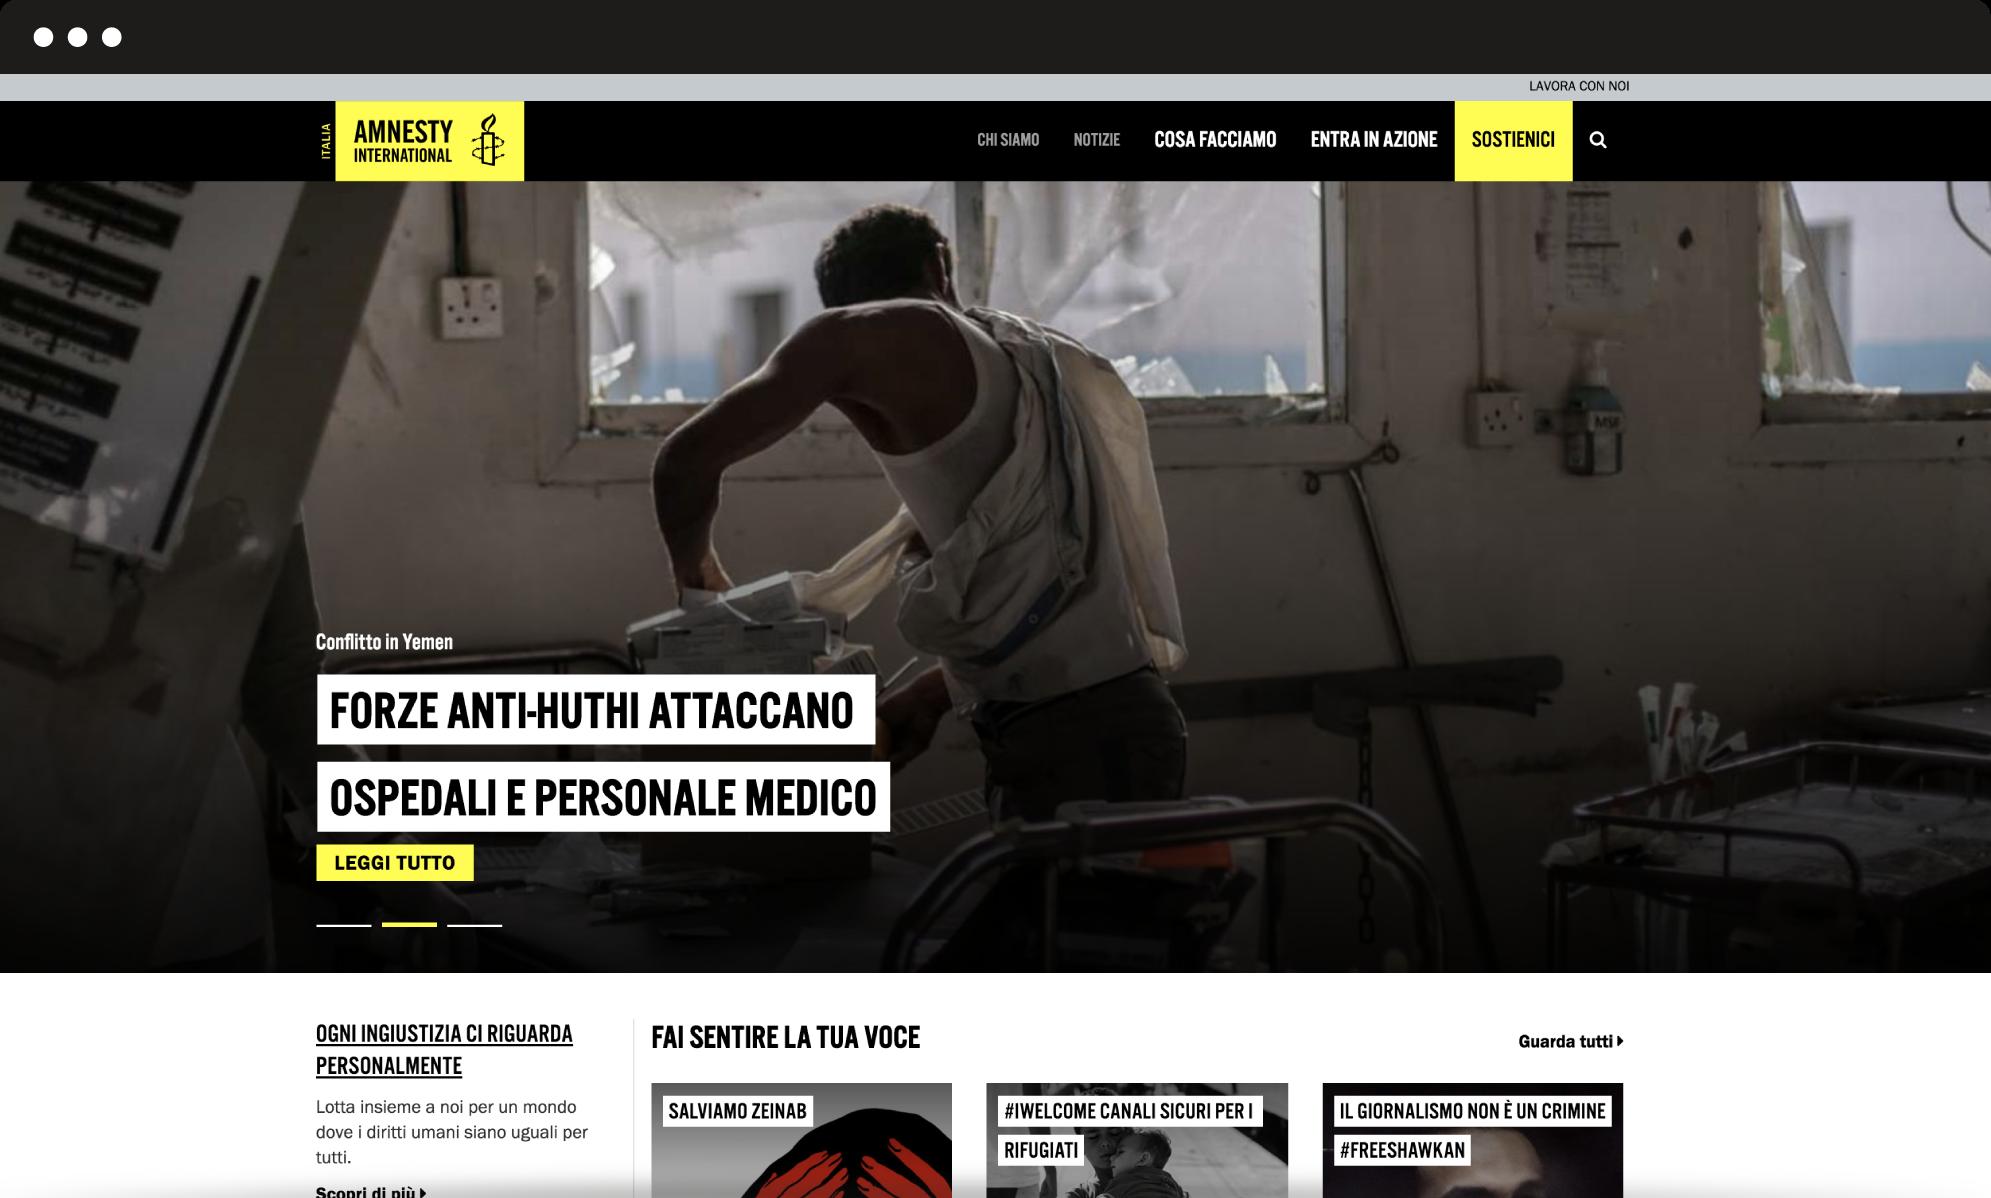 image of the website header